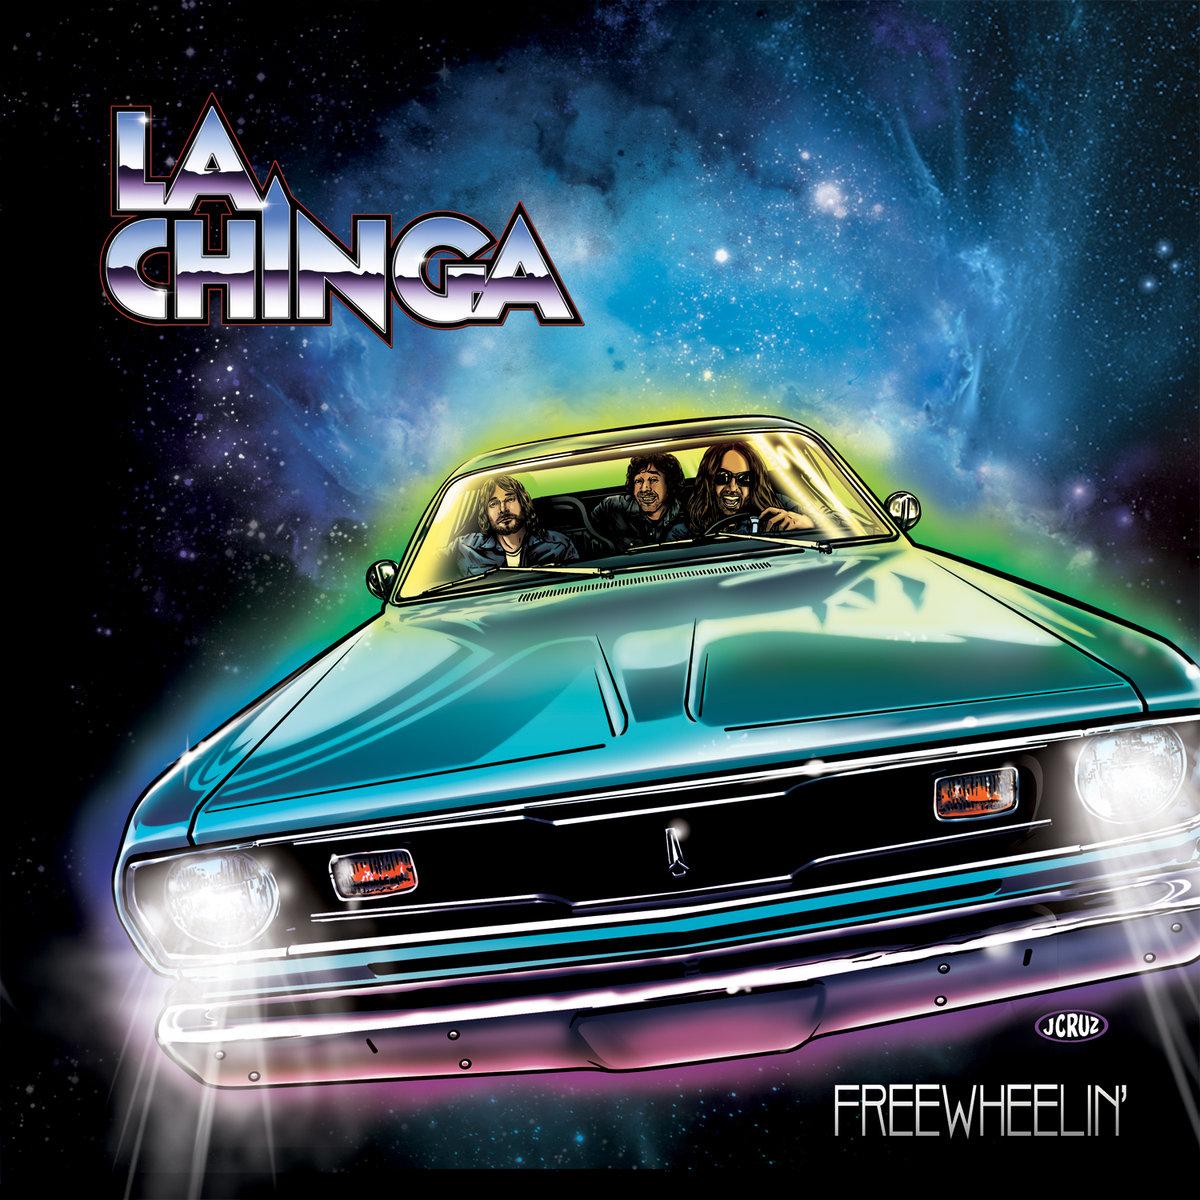 la chinga freewheelin